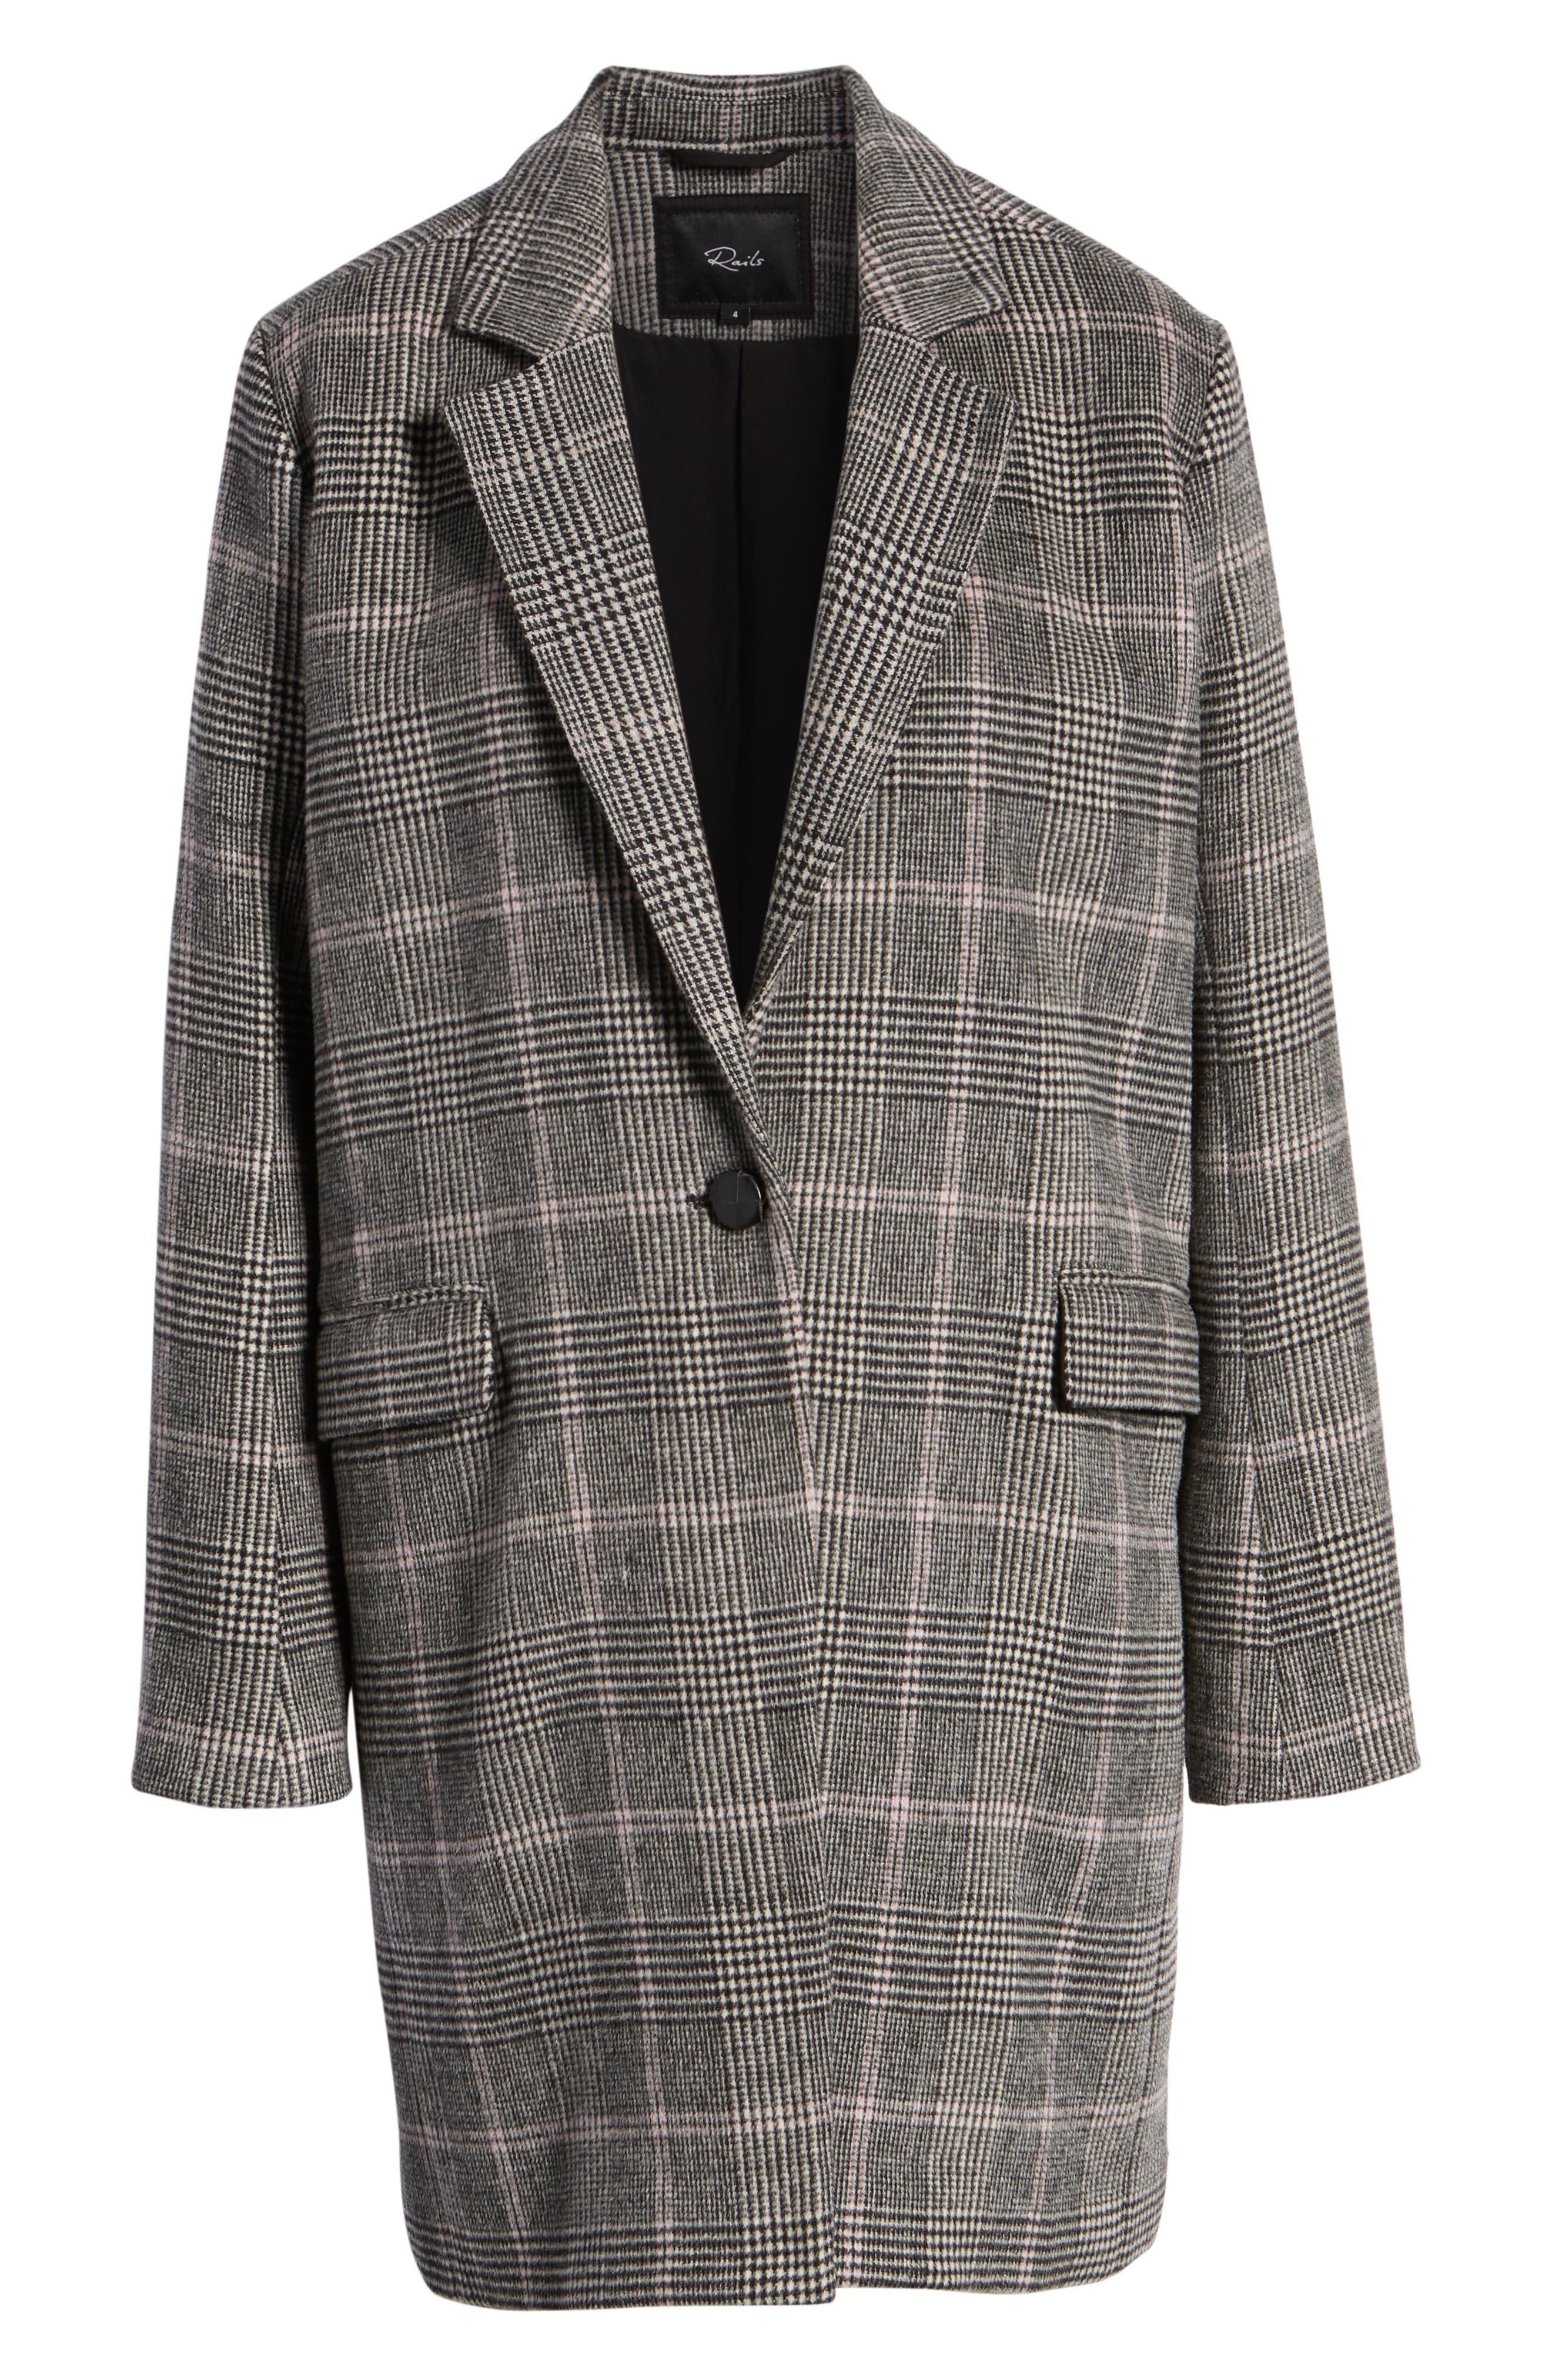 Anders Plaid Coat,                             Alternate thumbnail 7, color,                             021